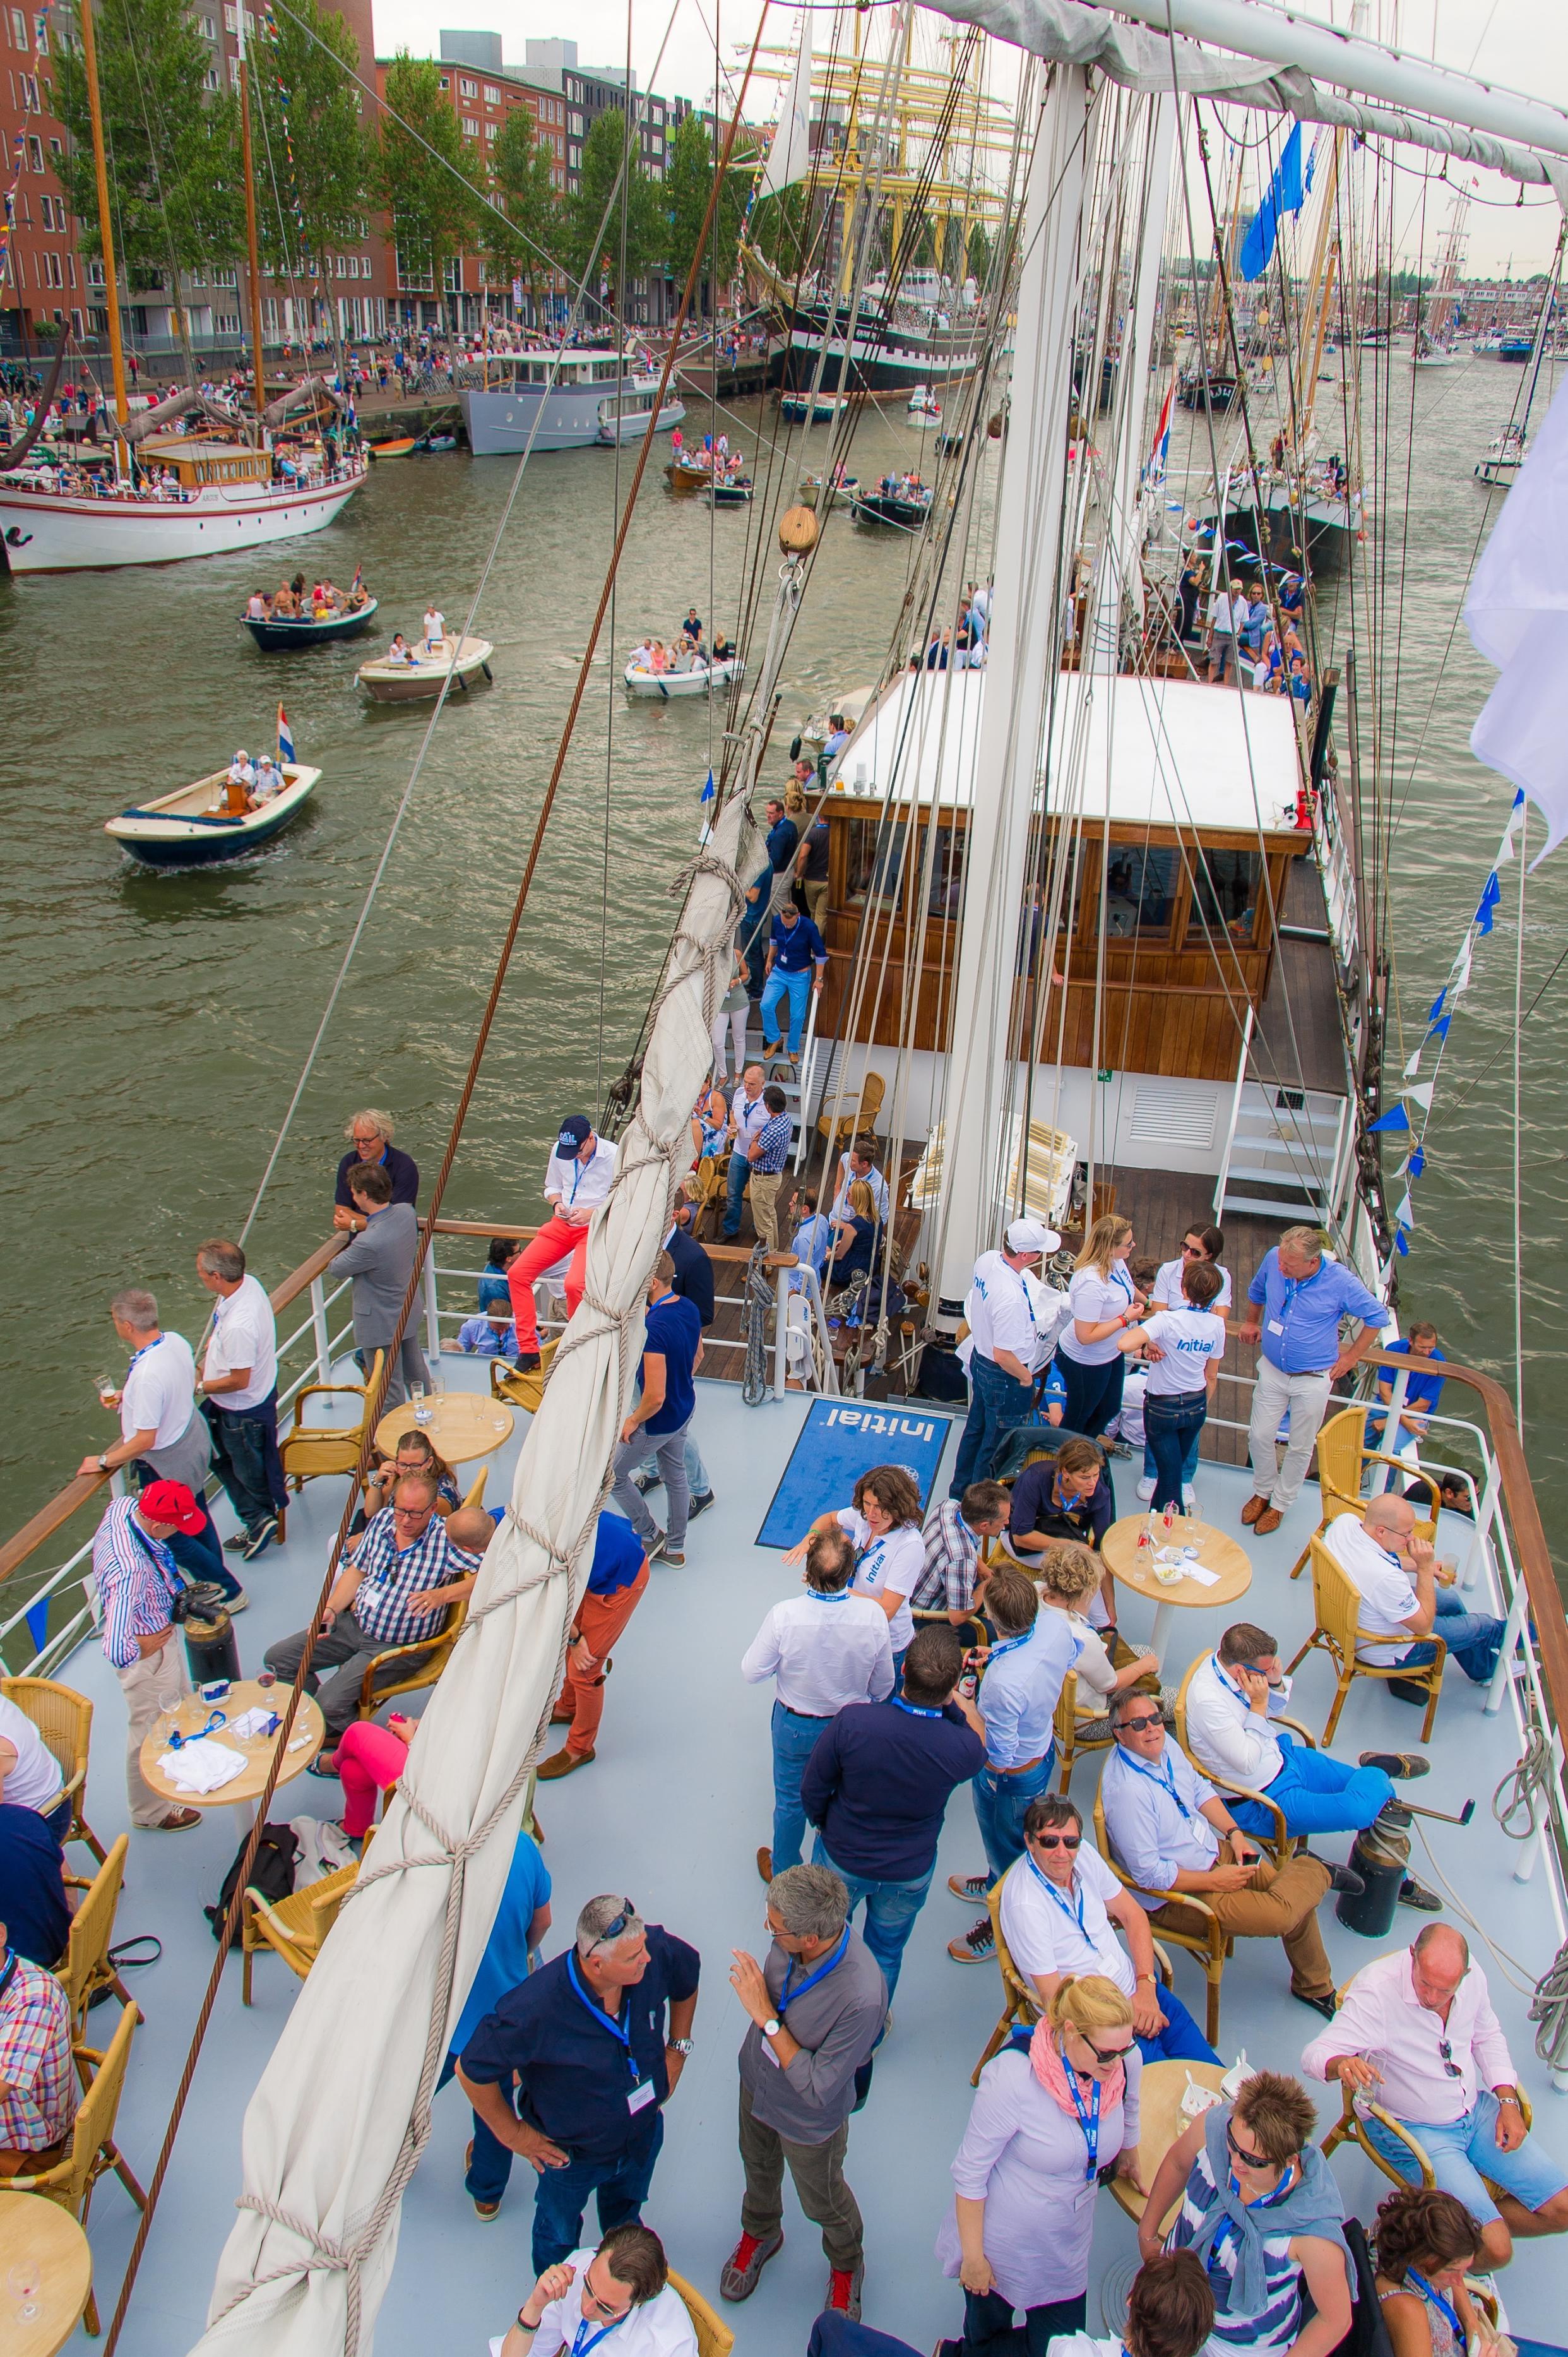 Initial Klantenbinding Event tijdens Sail '15